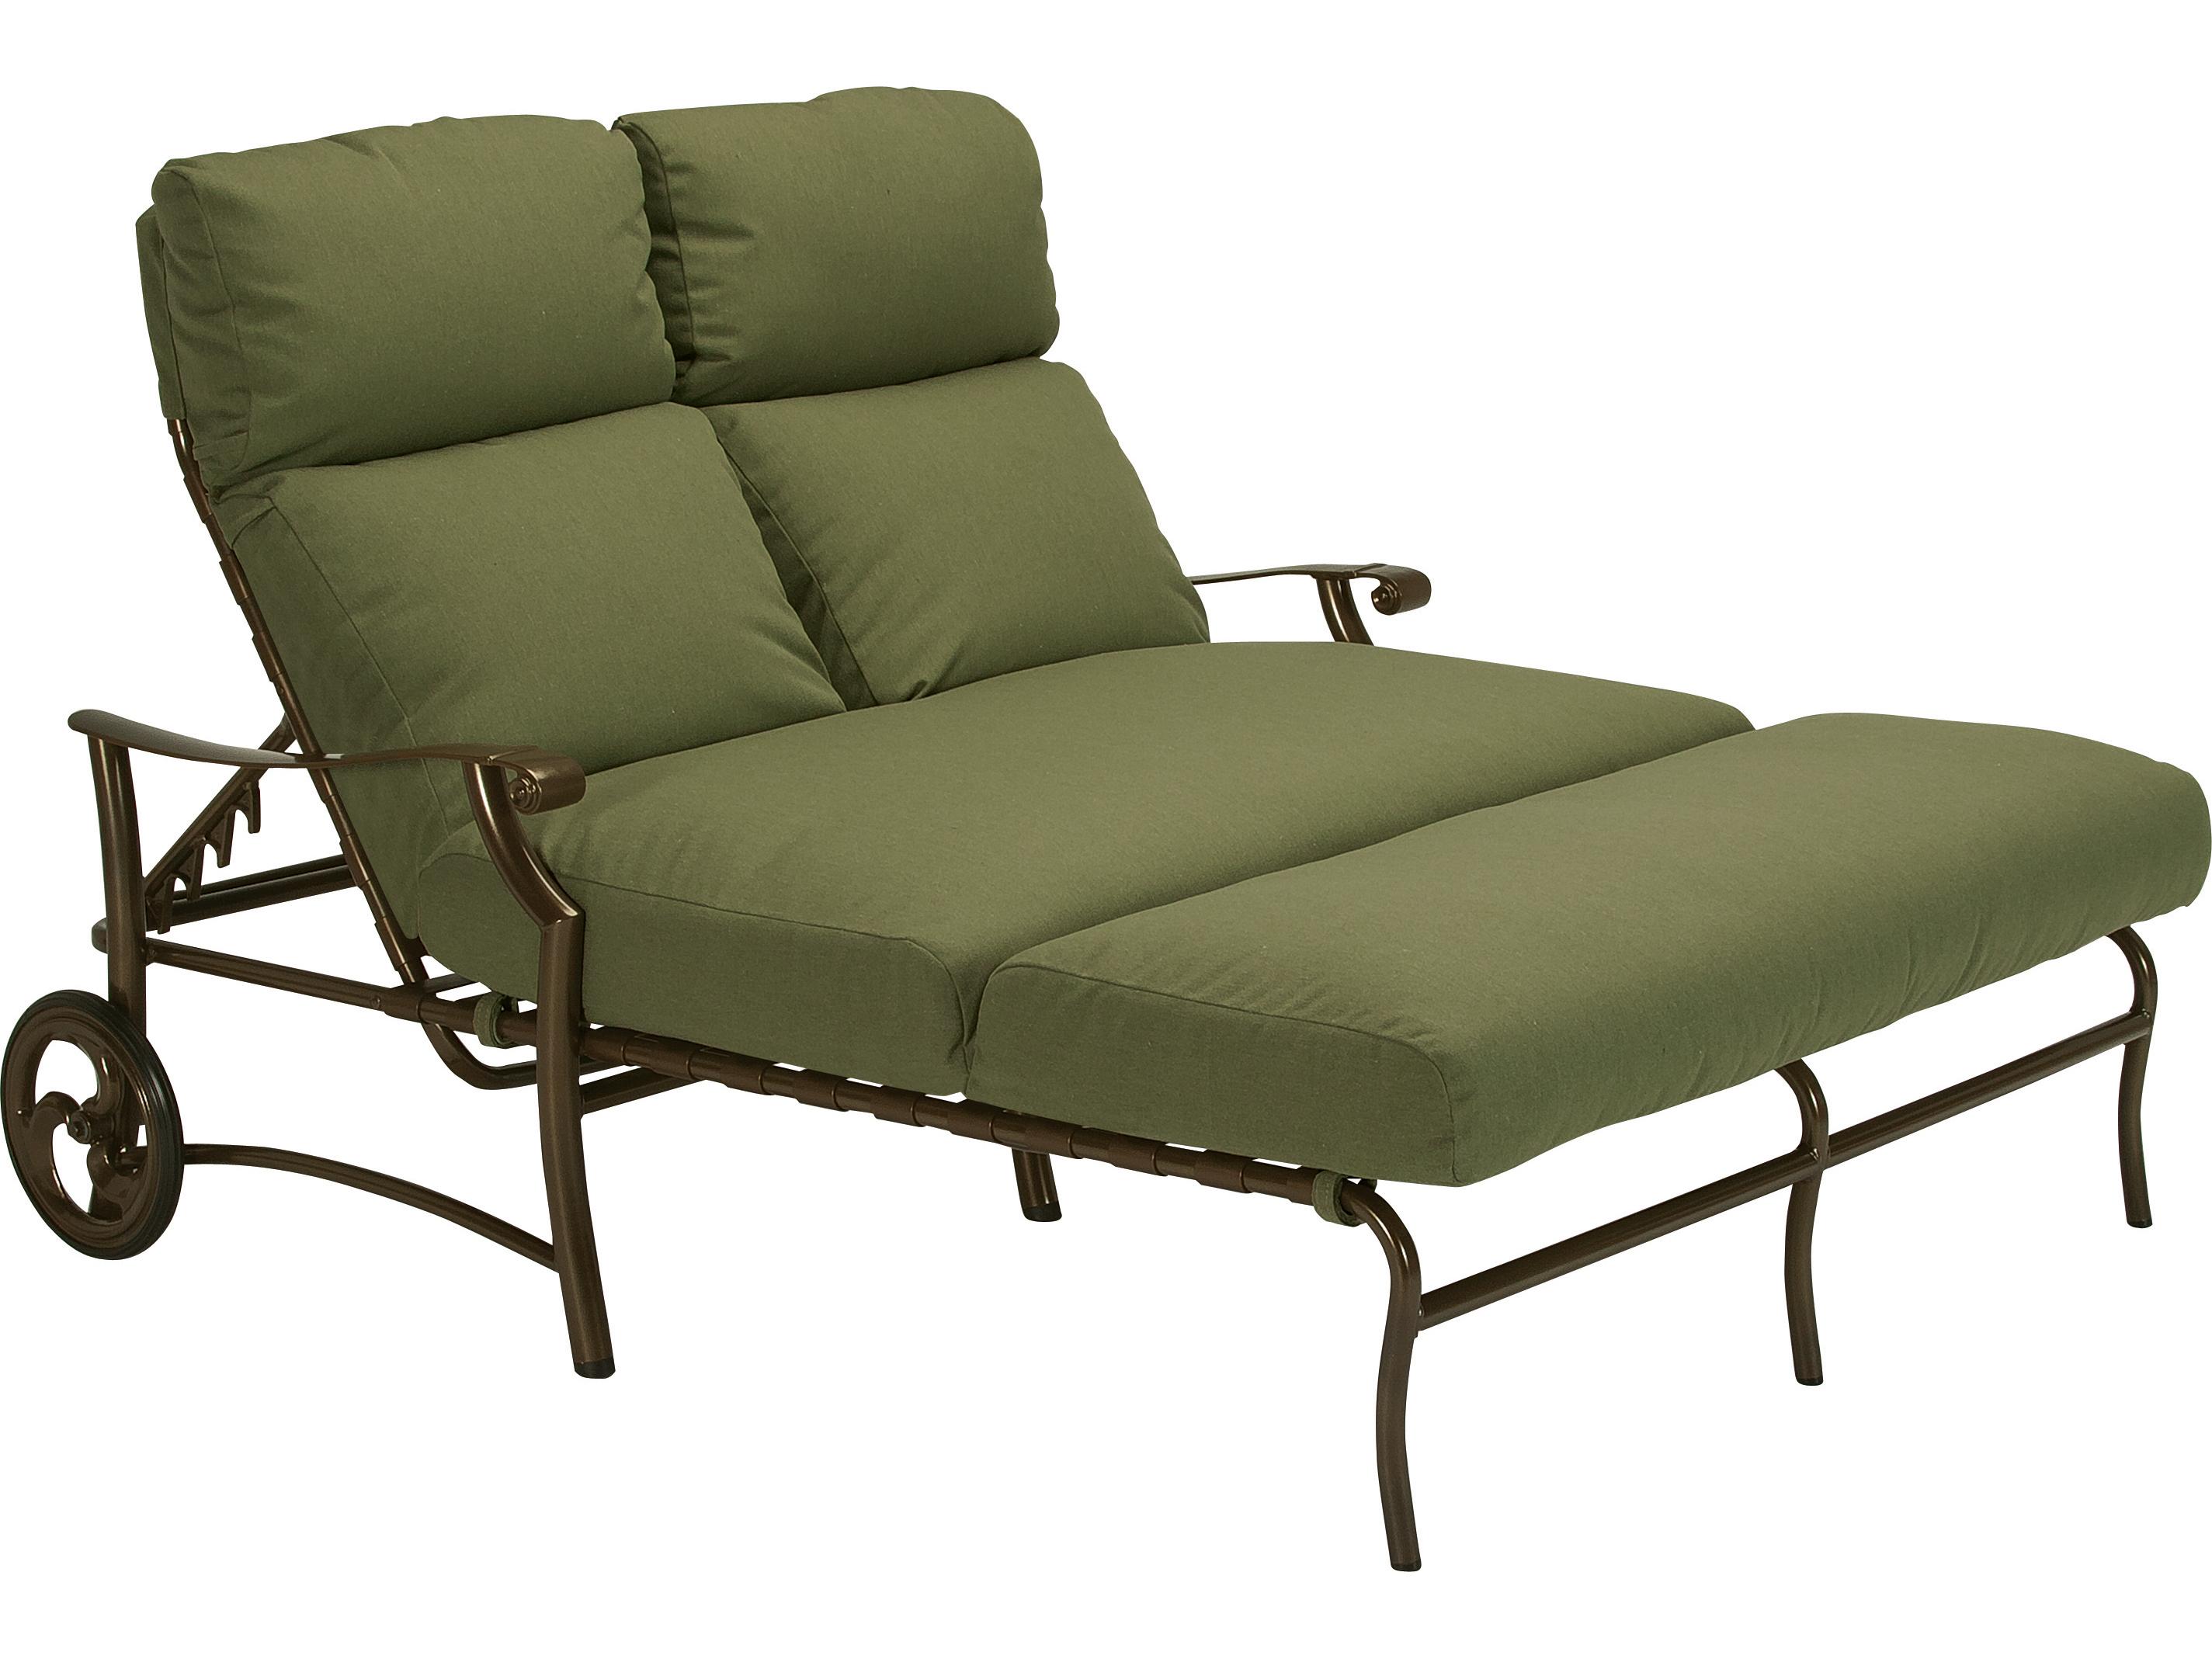 Tropitone Montreux Ii Relaxplus Replacement Cushion